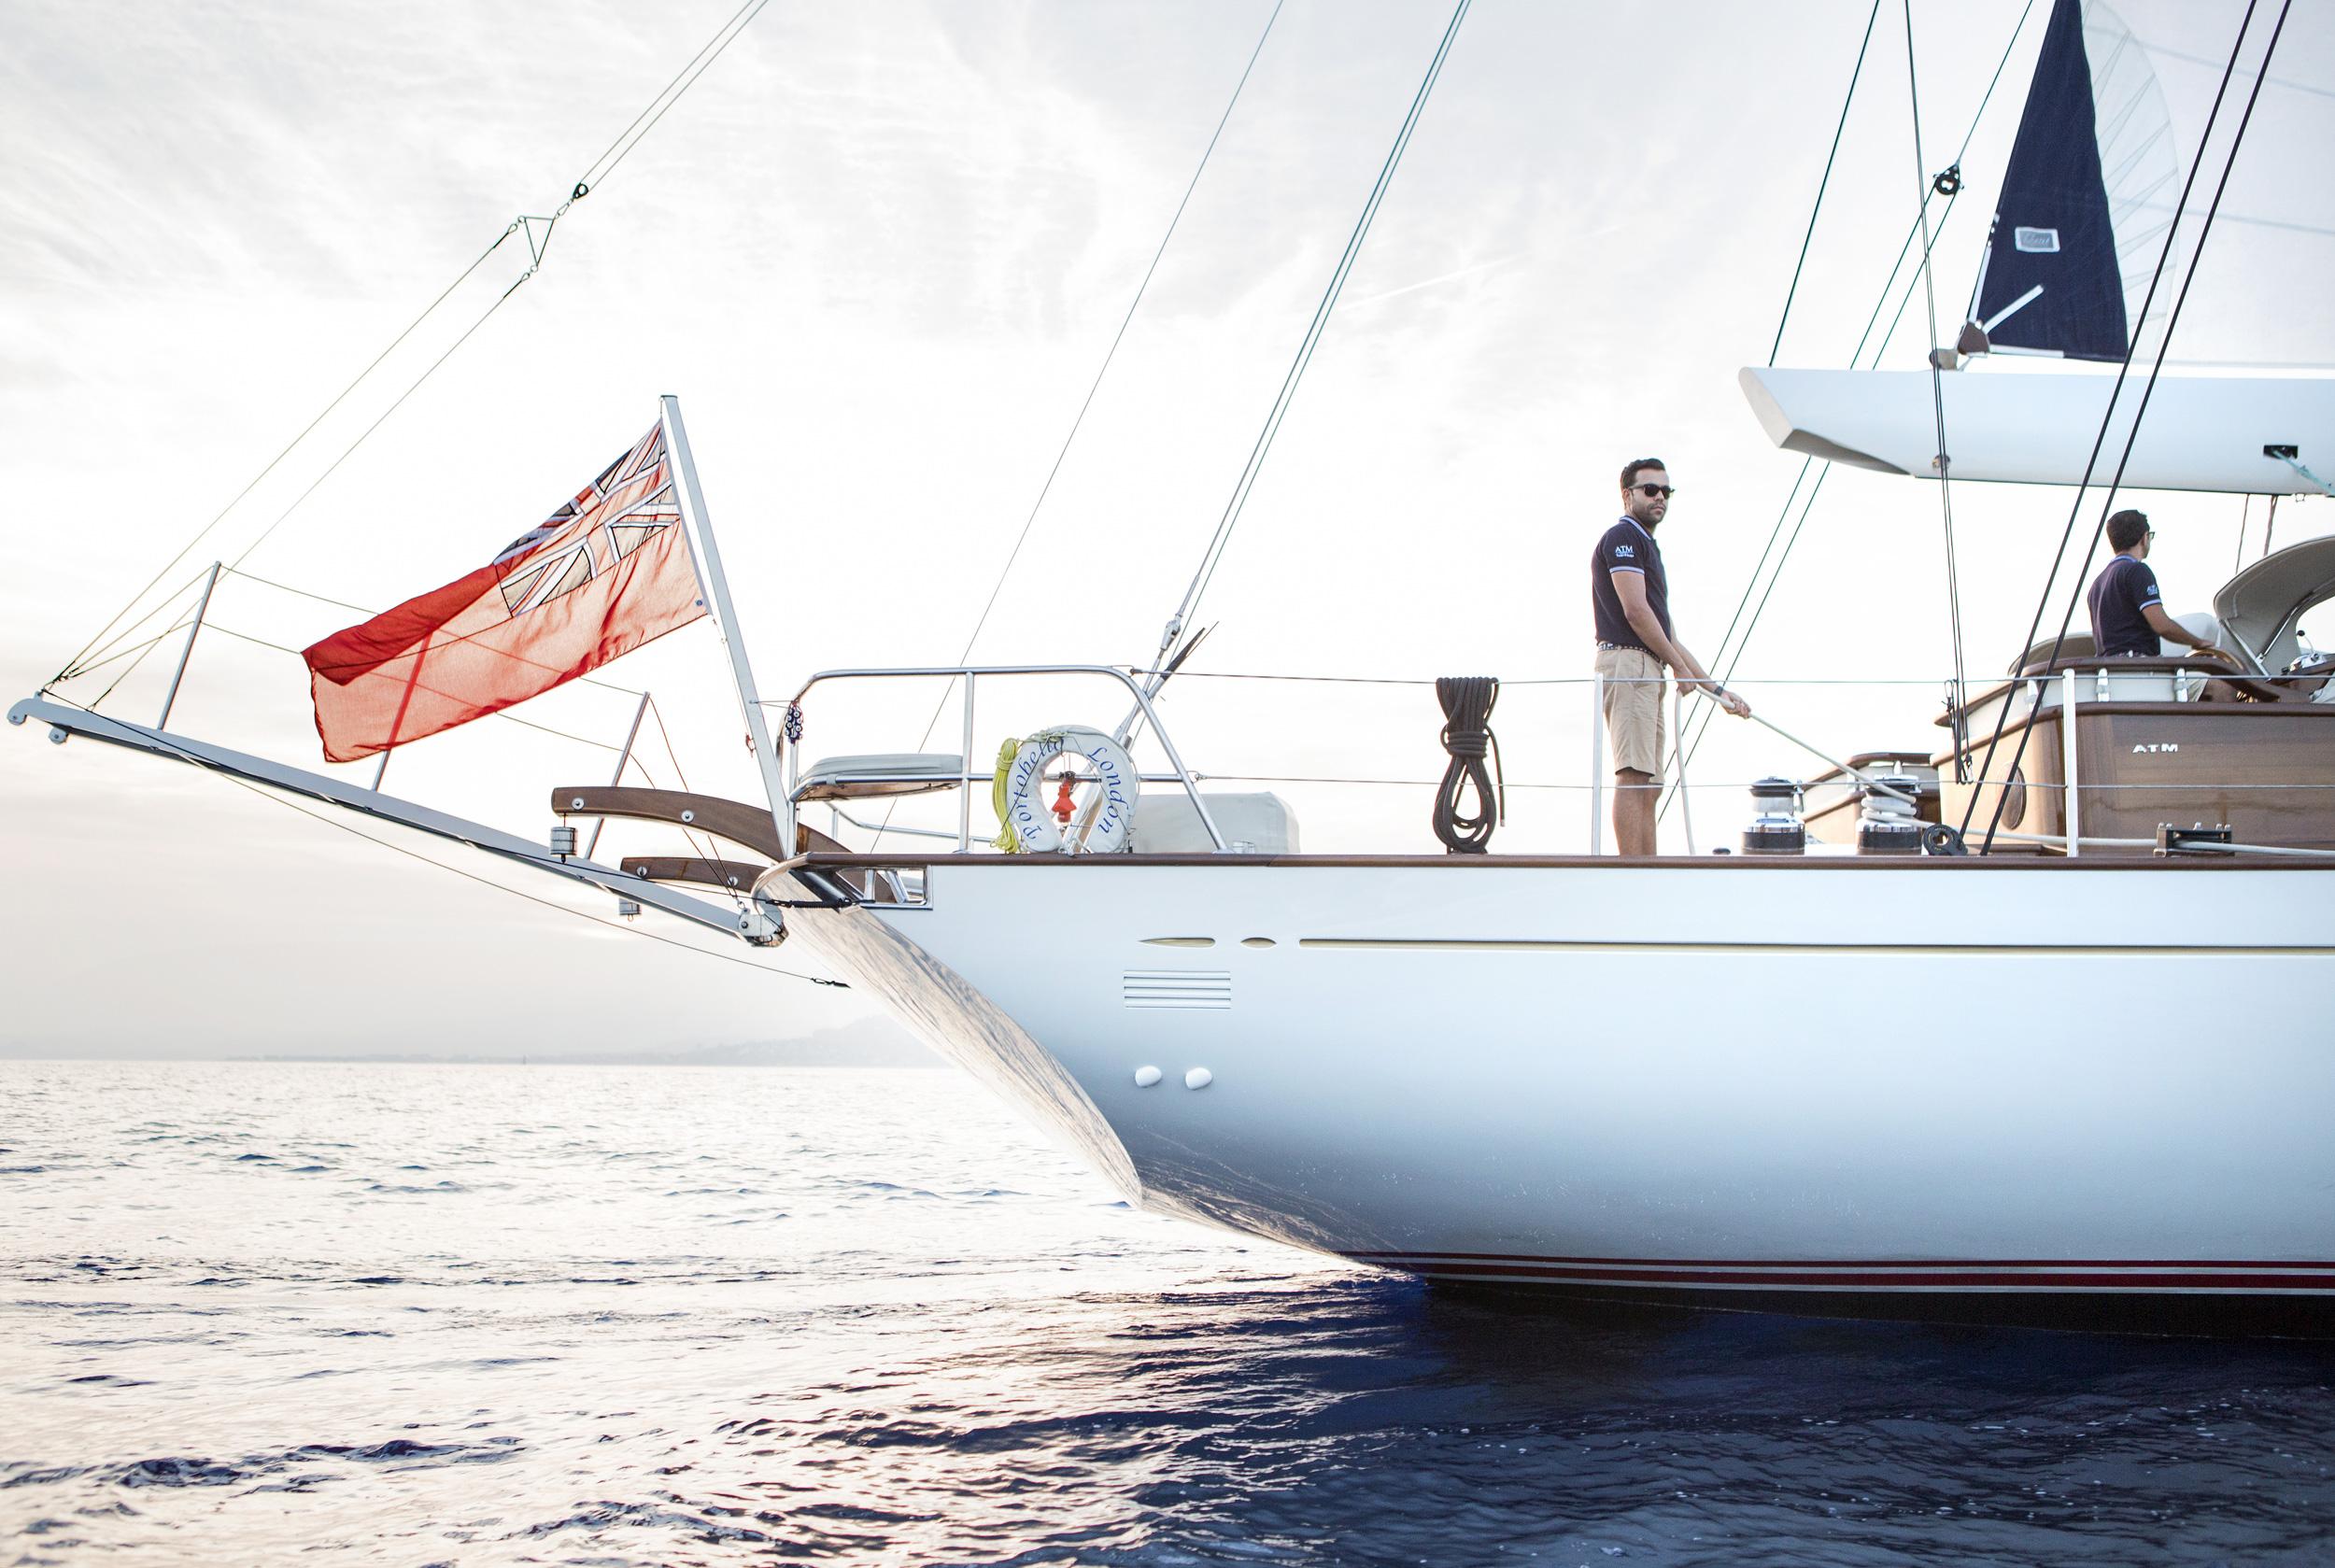 portobello-yacht-image-3.jpg